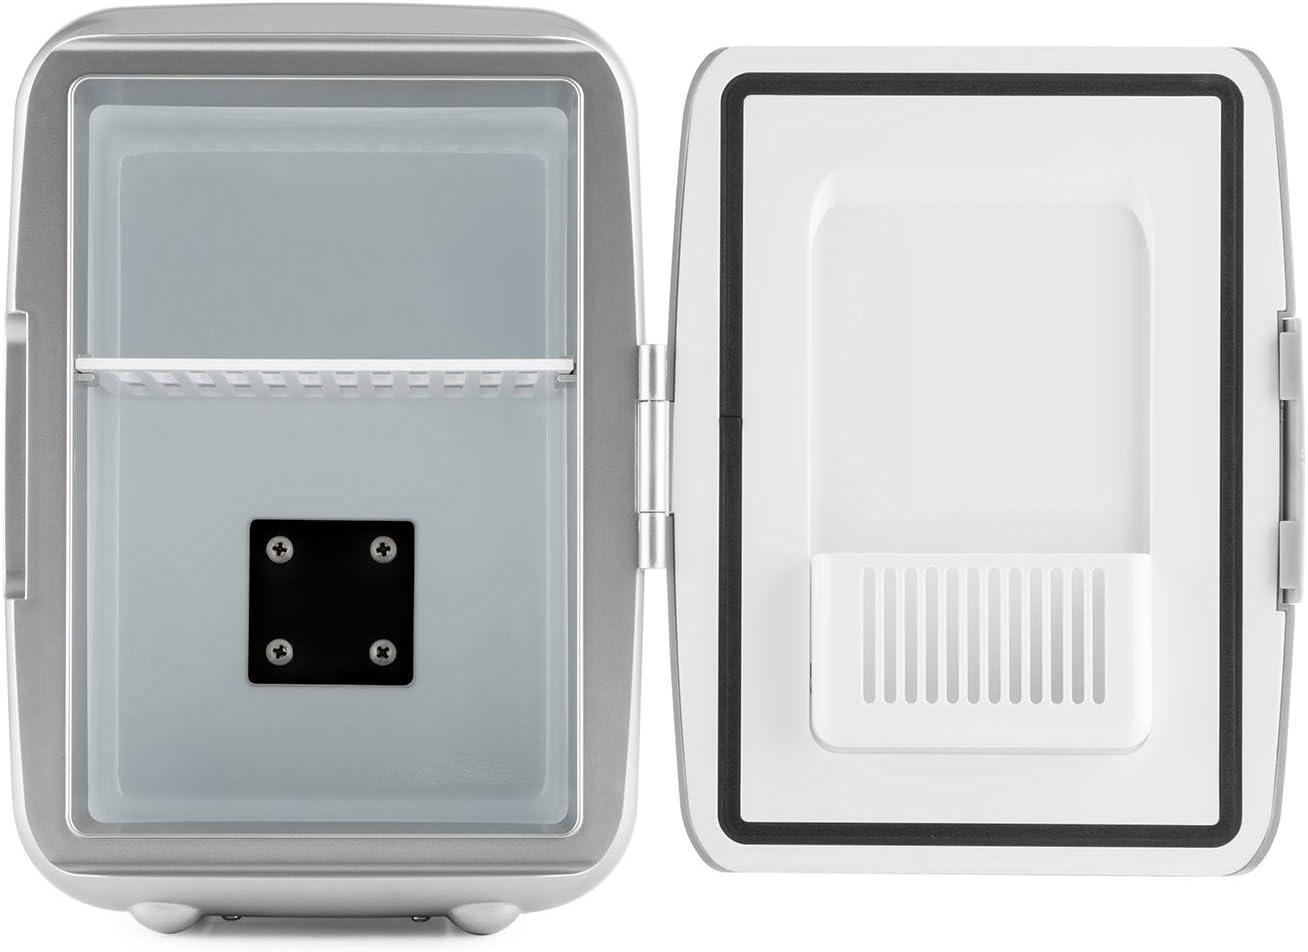 Oneconcept Picknicker Mini Termo Frio Calor (Mini Nevera térmica, Volumen de 4 litros, Certificado eMark, Liviana y asa Plegable, AC, DC, Auto) - Plata Plata